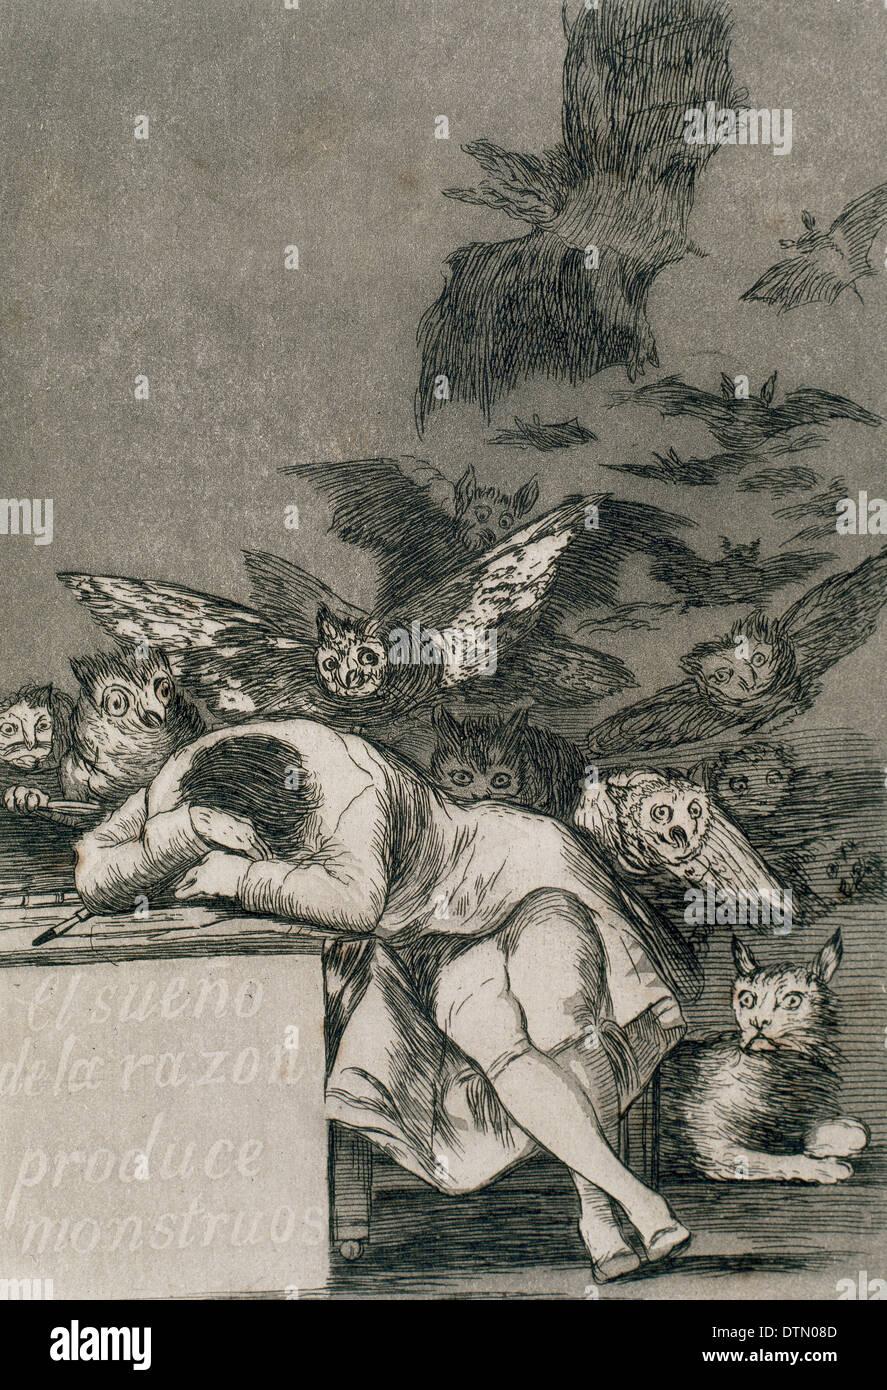 Francisco de Goya (1746-1828). Spanish painter and printmaker. Los Caprichos. ¿Donde va mama? (Where are you going mum?). - Stock Image